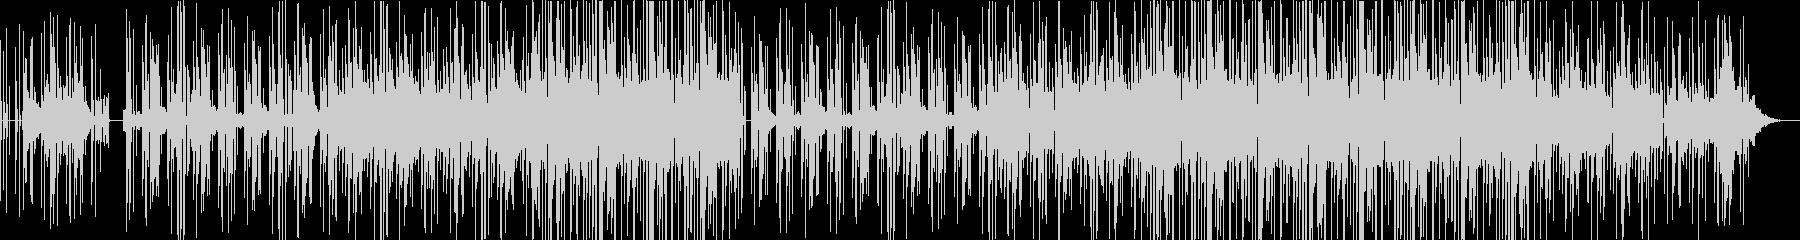 HIPHOPトラック洋楽風の未再生の波形